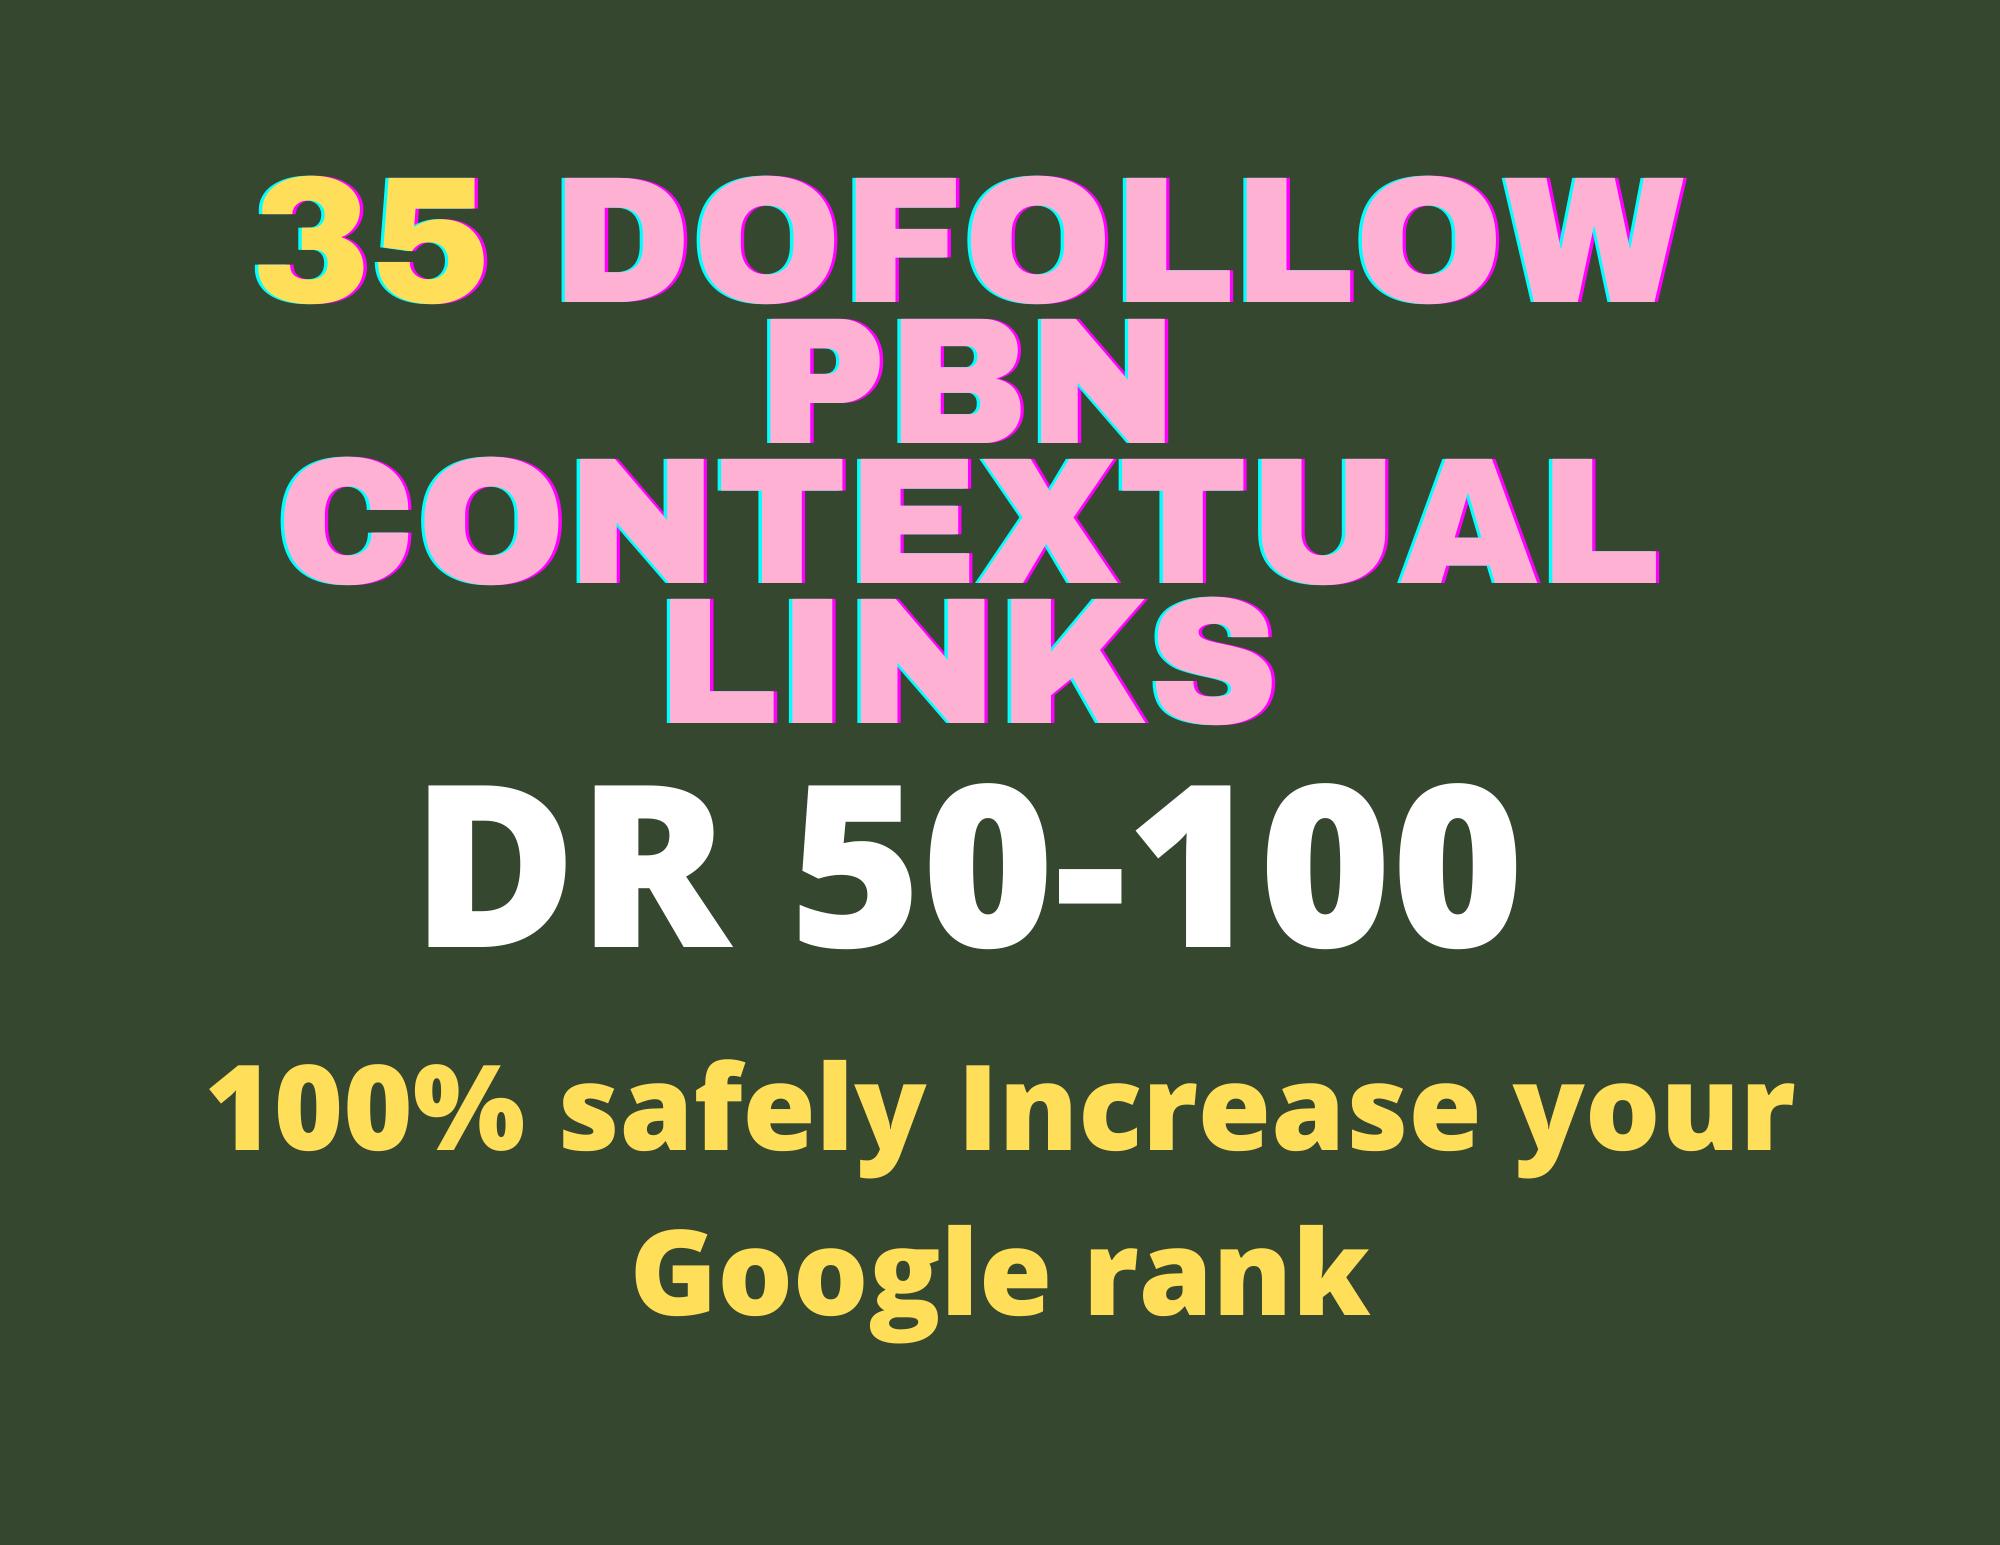 Dofollow 35 PBNs Backlinks DR 100 to 50 - Definitely skyrocket your Google Ranking